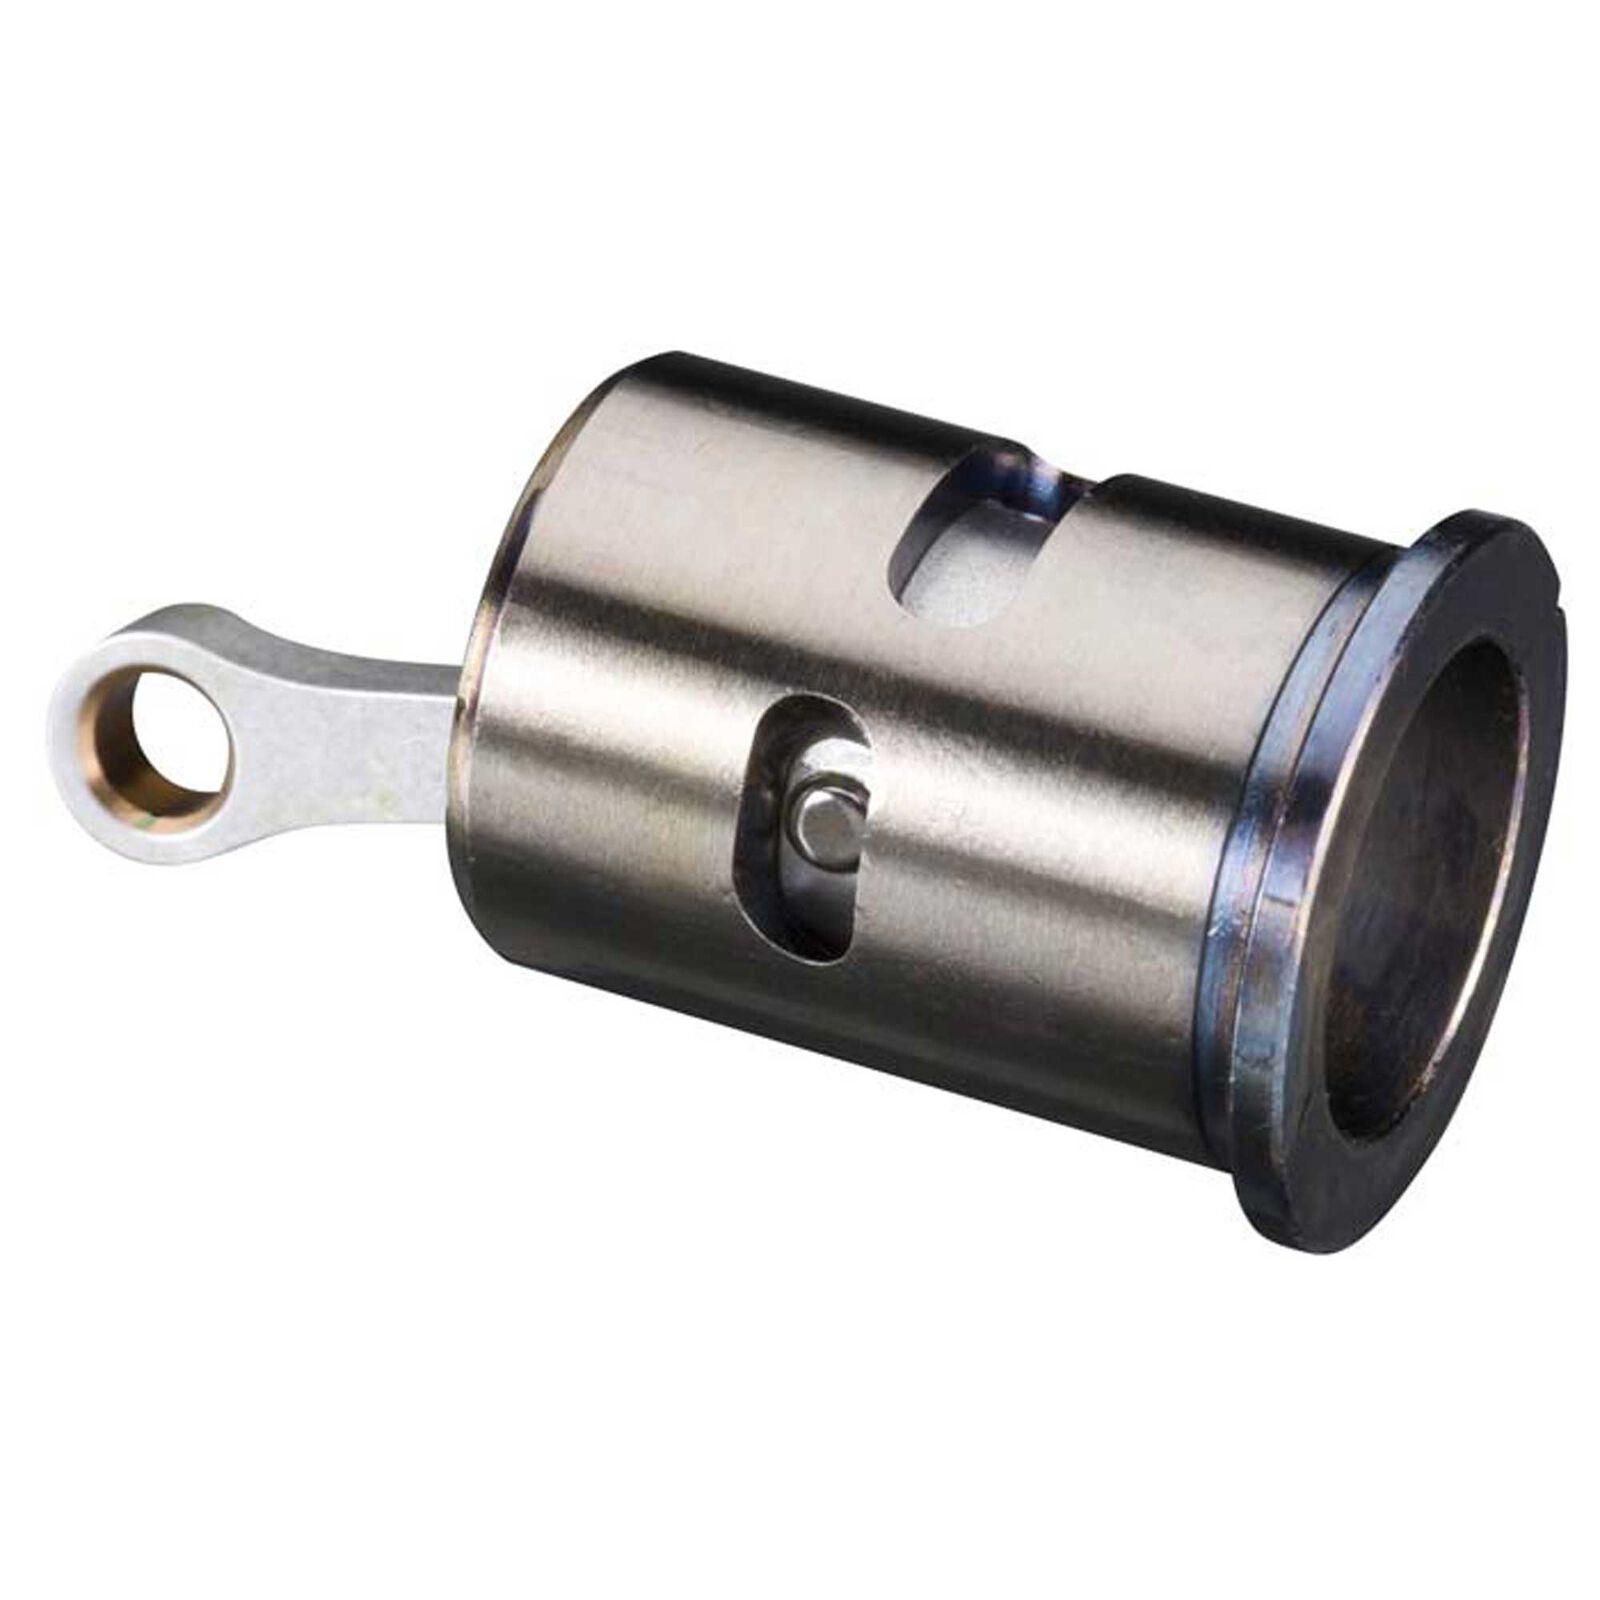 Cylinder/Piston/Connecting Rod: 10LA